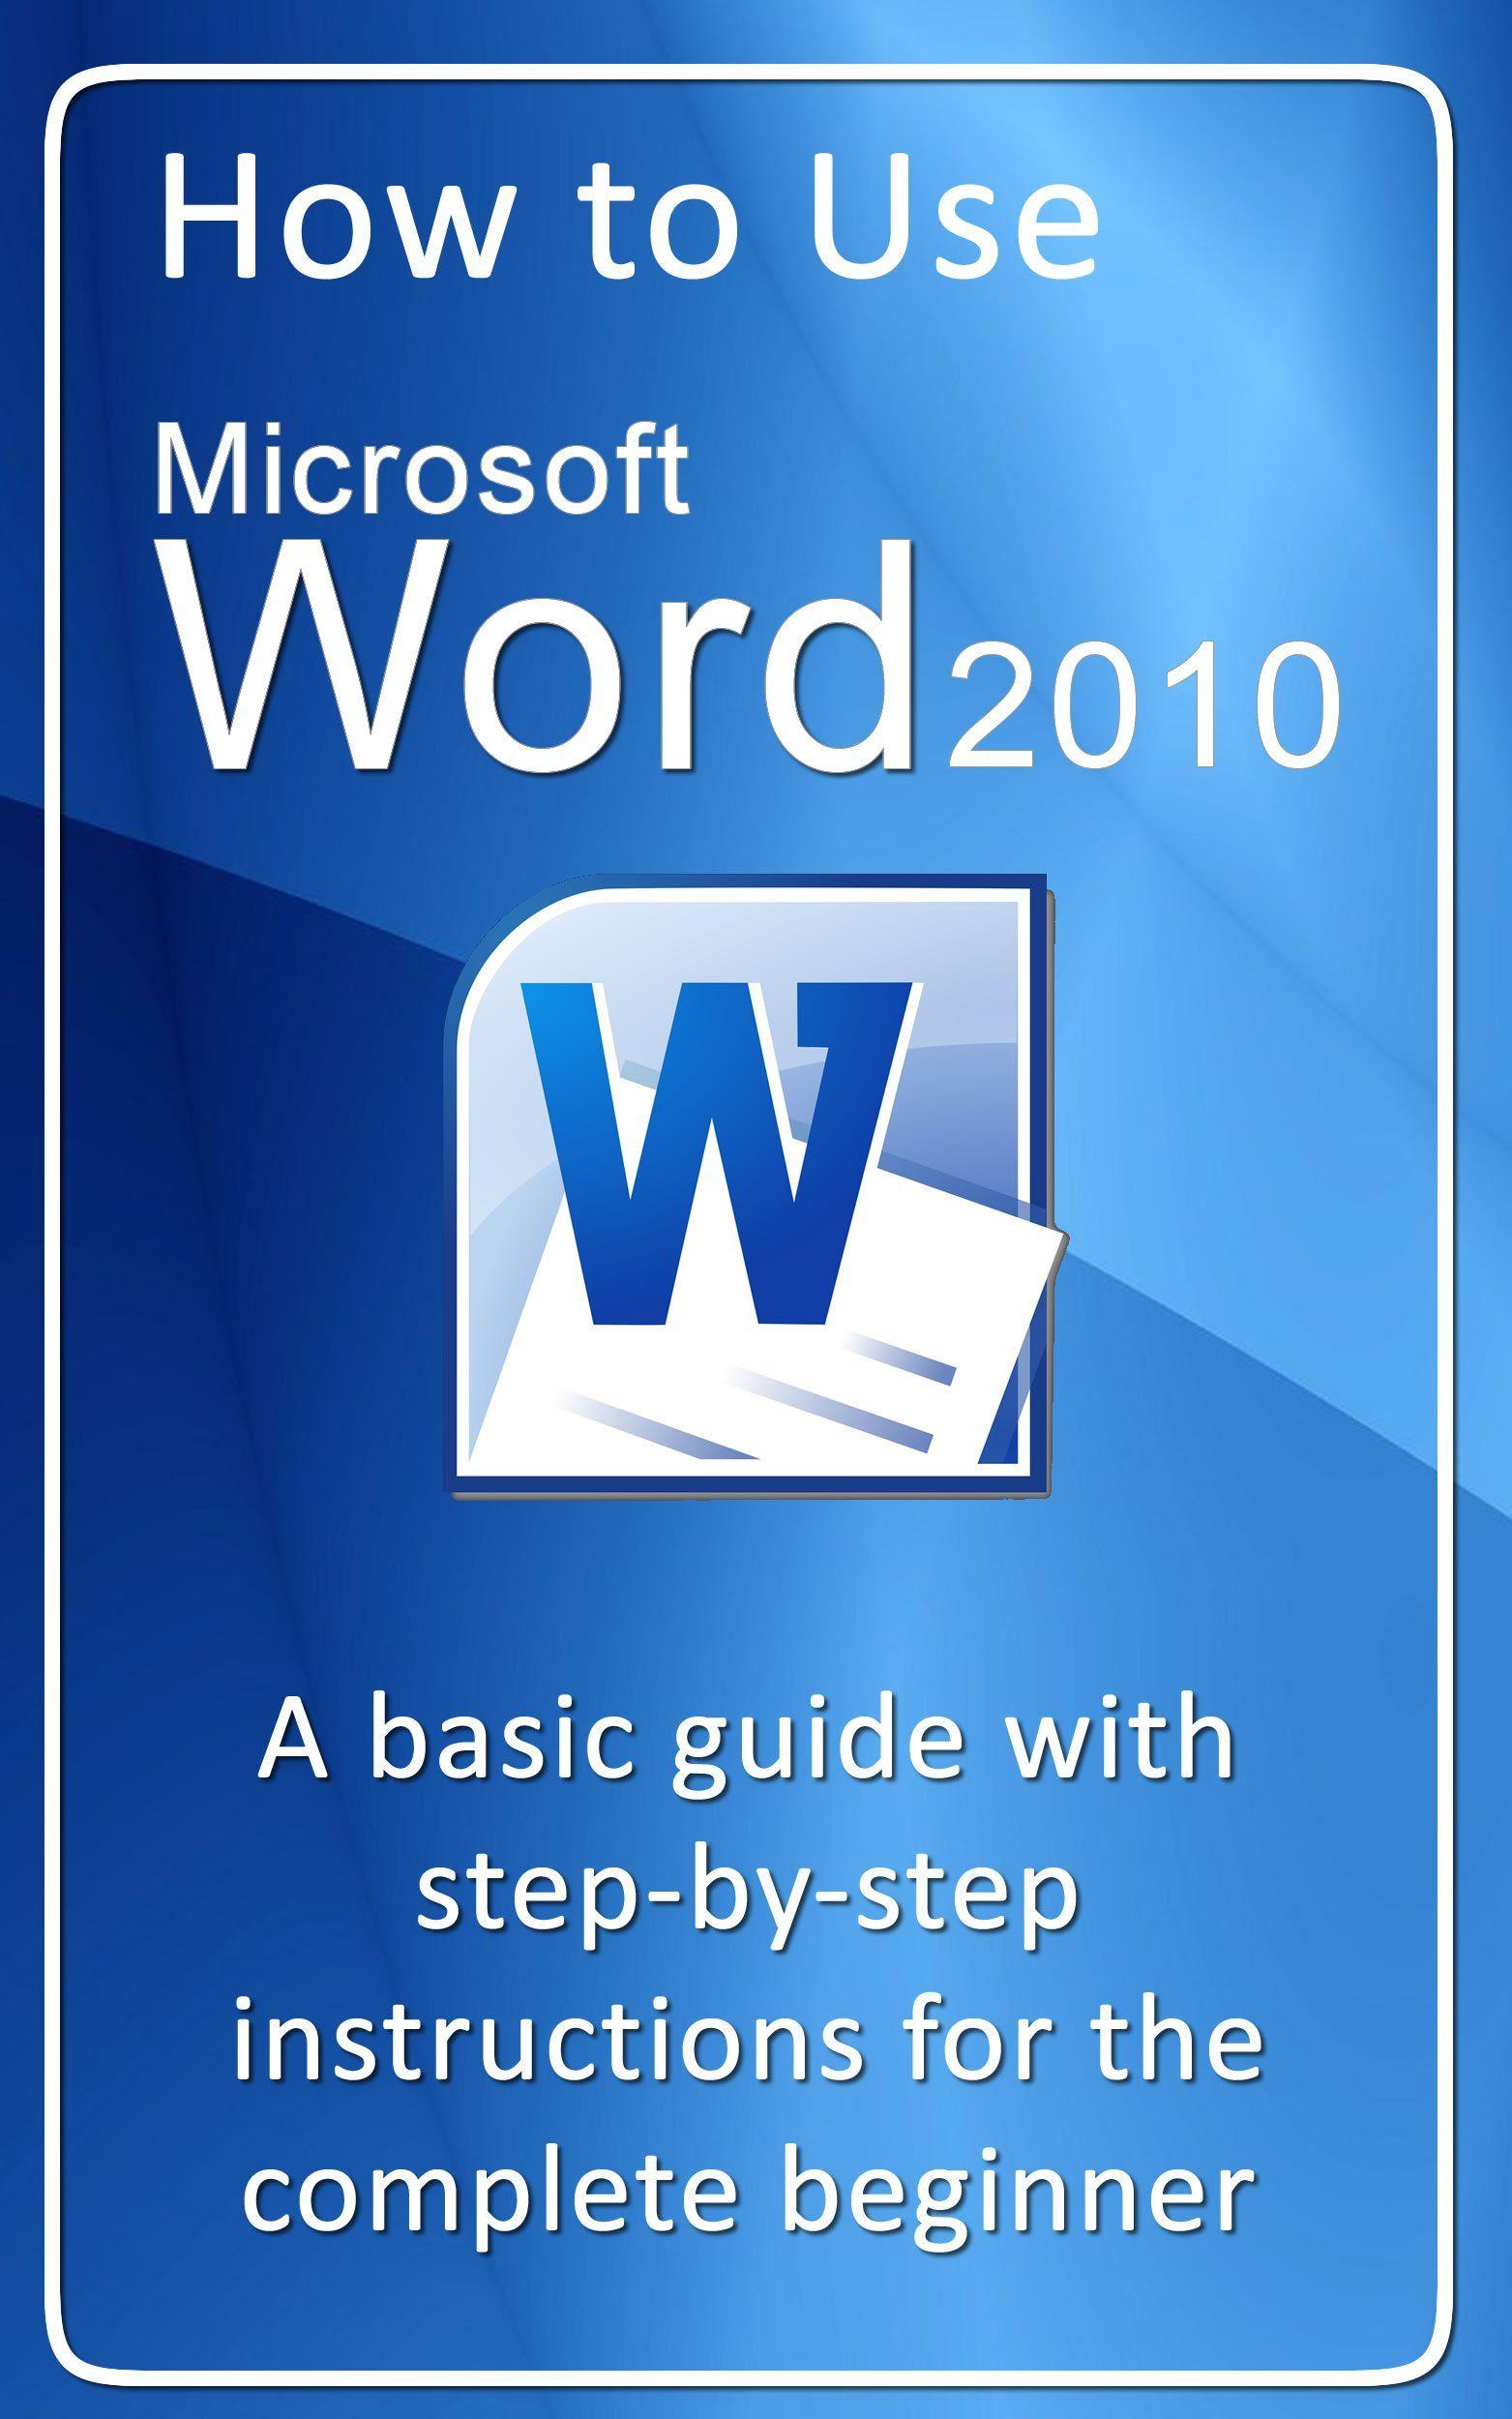 How to use Microsoft Word 2010 (How to use Microsoft Office 2010)